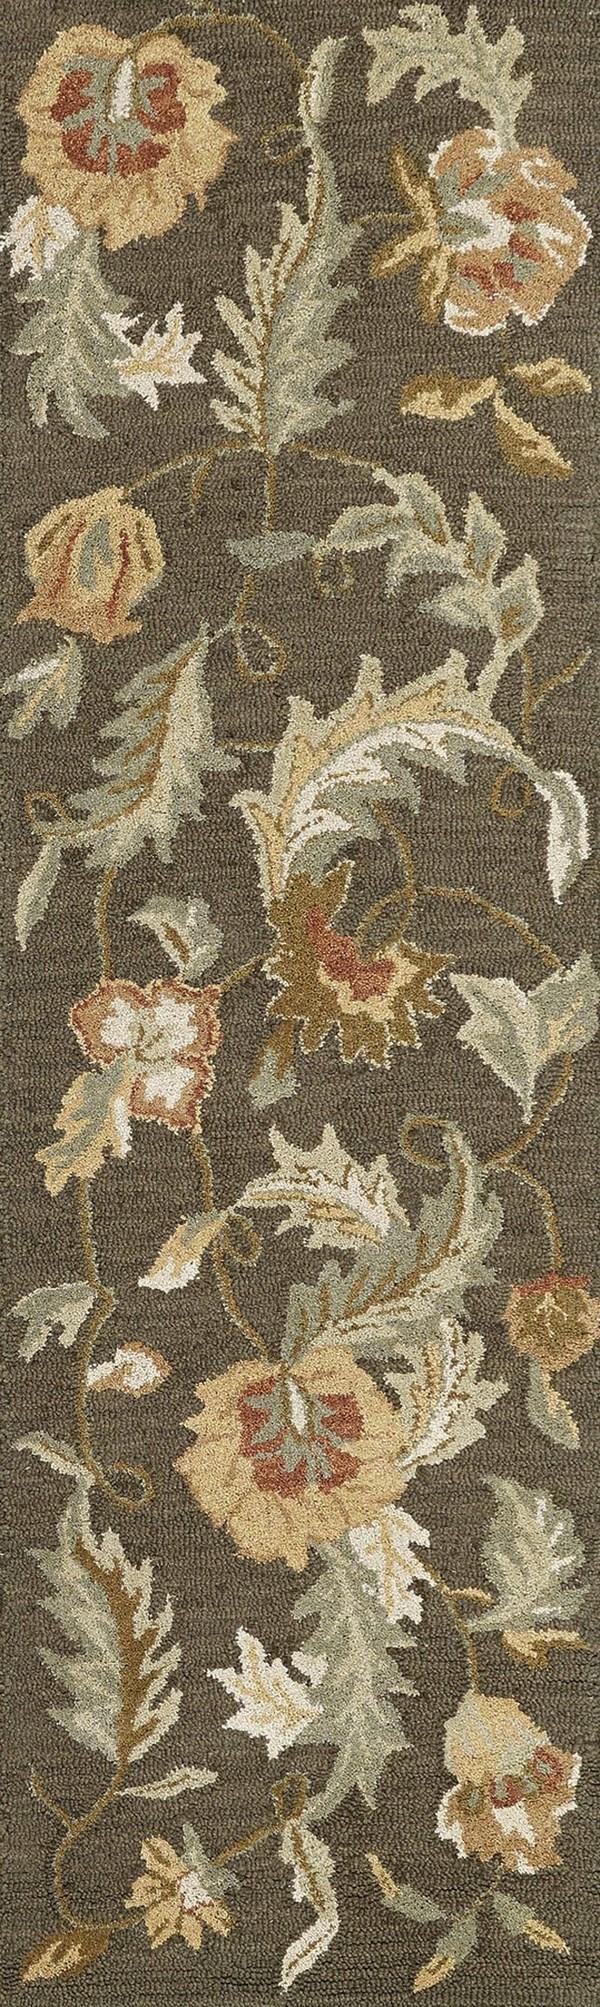 Charcoal, Mocha Brown, Mint Green (3338) Floral / Botanical Area Rug